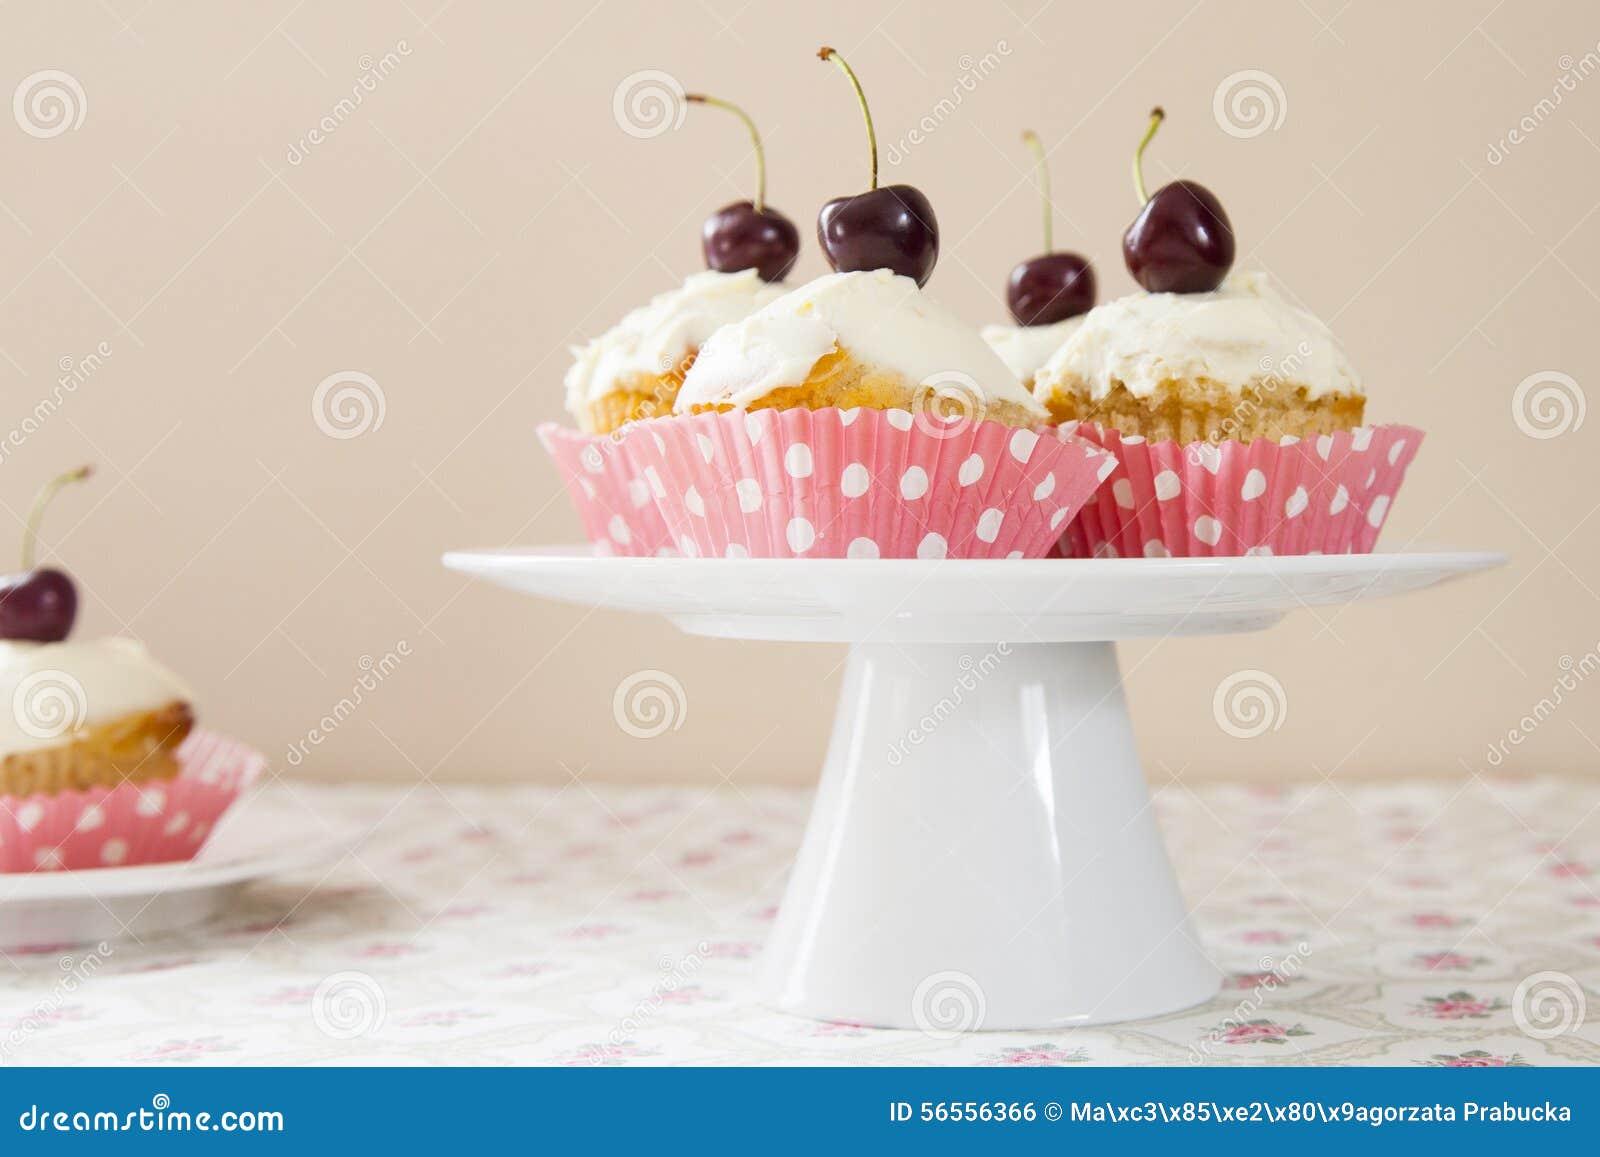 Download Cupcakes στοκ εικόνες. εικόνα από κρέμα, καλύμματα, γλυκά - 56556366